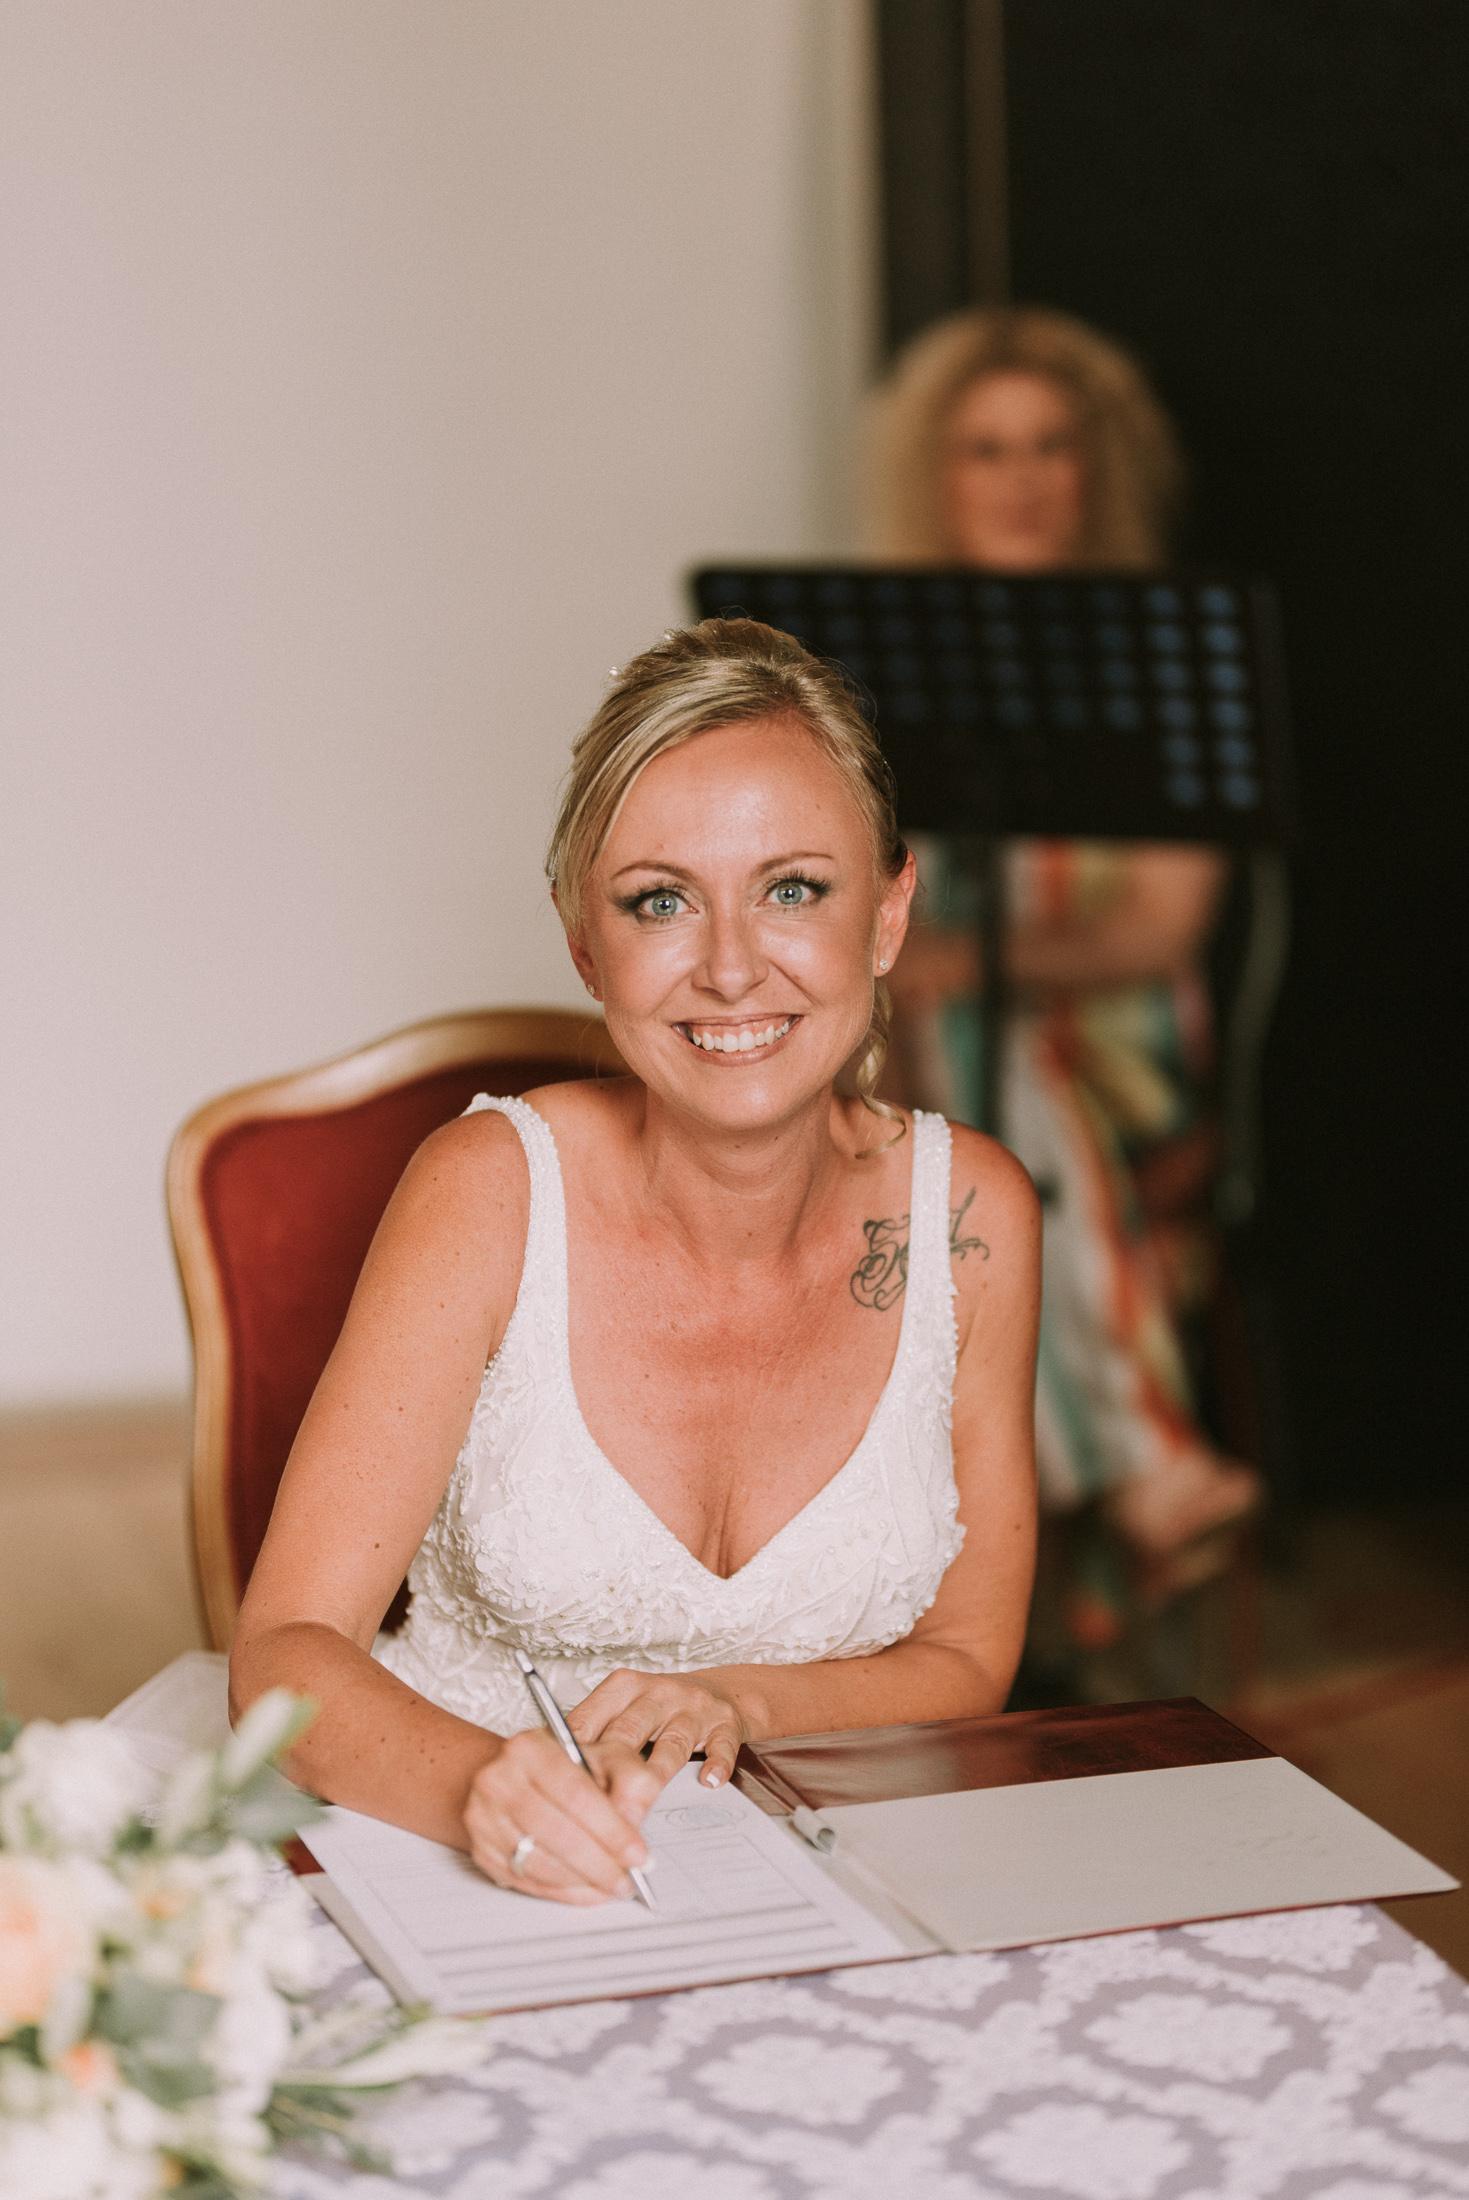 SebastianDon-Hochzeitsfotograf-Wien Umgebung-16.jpg